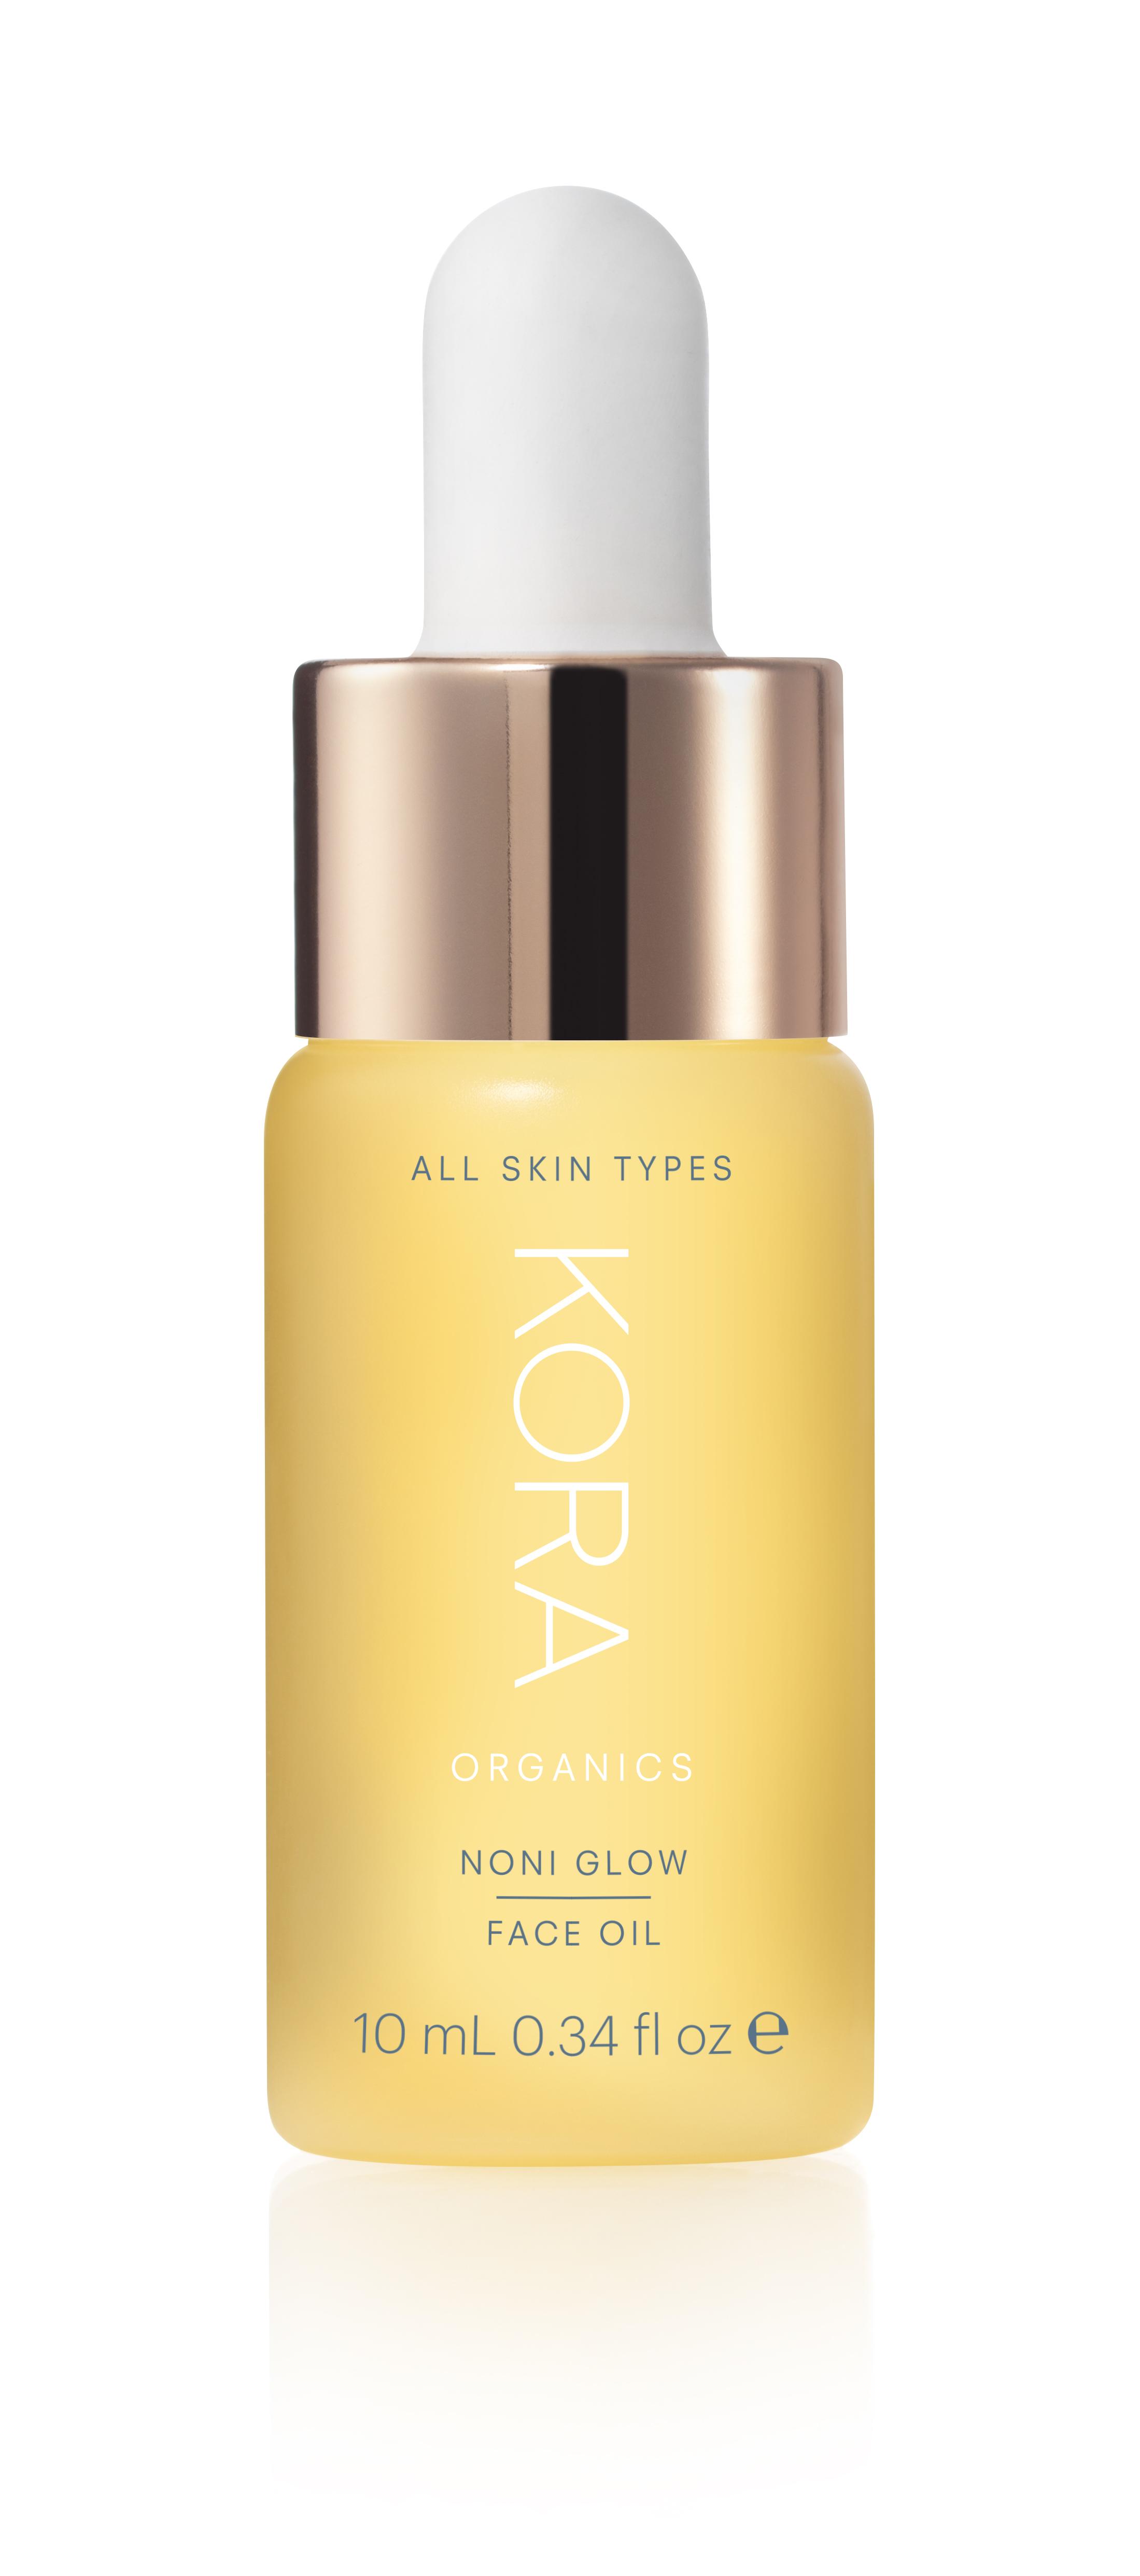 Kora Organics Noni Glow Facial 10ml